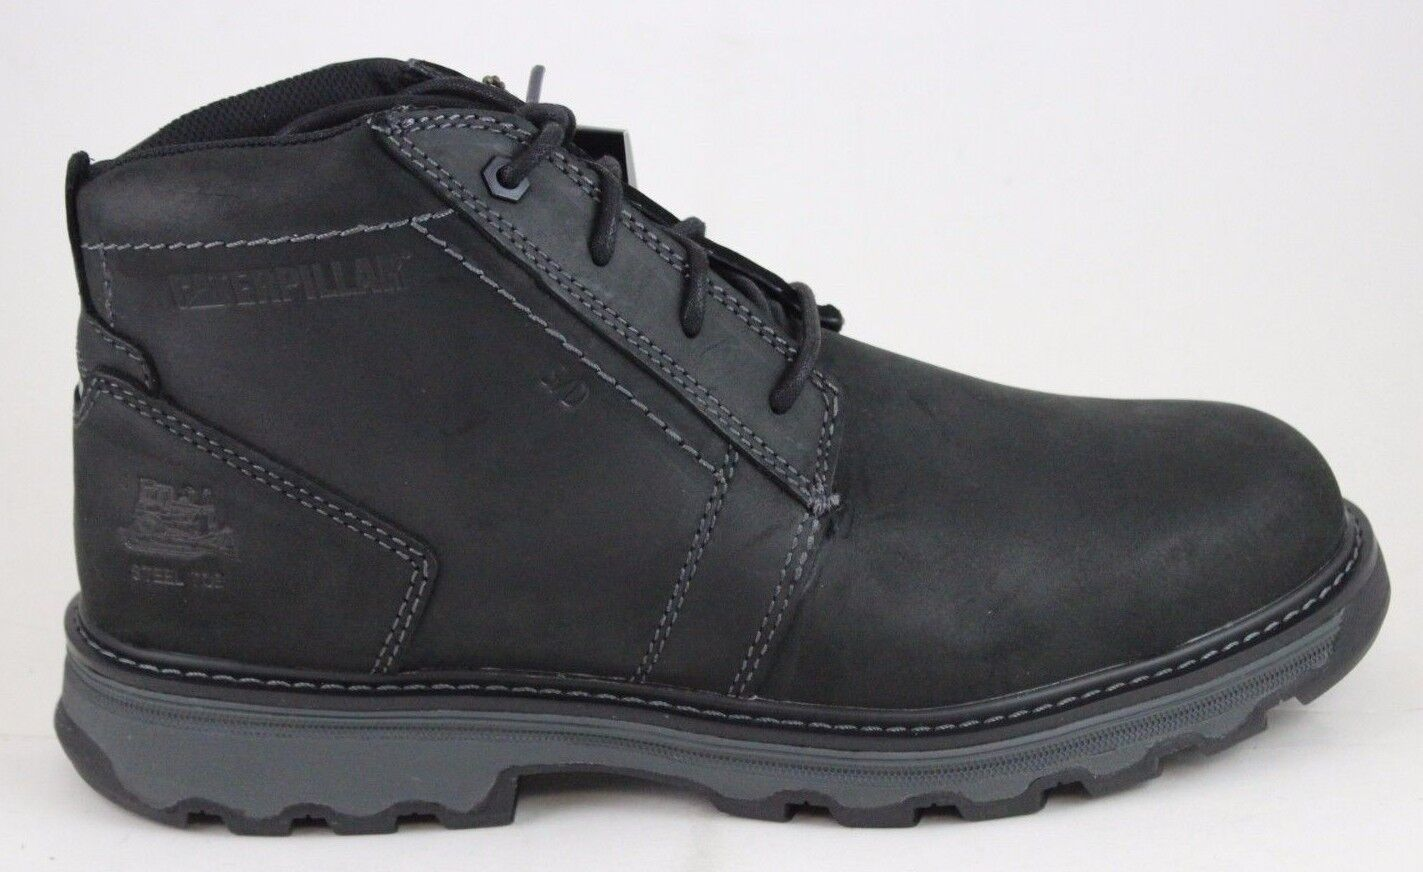 bf9f175df35 Men's CAT Caterpillar Parker Black Leather Steel Toe Work Boot P90714 Brand  New